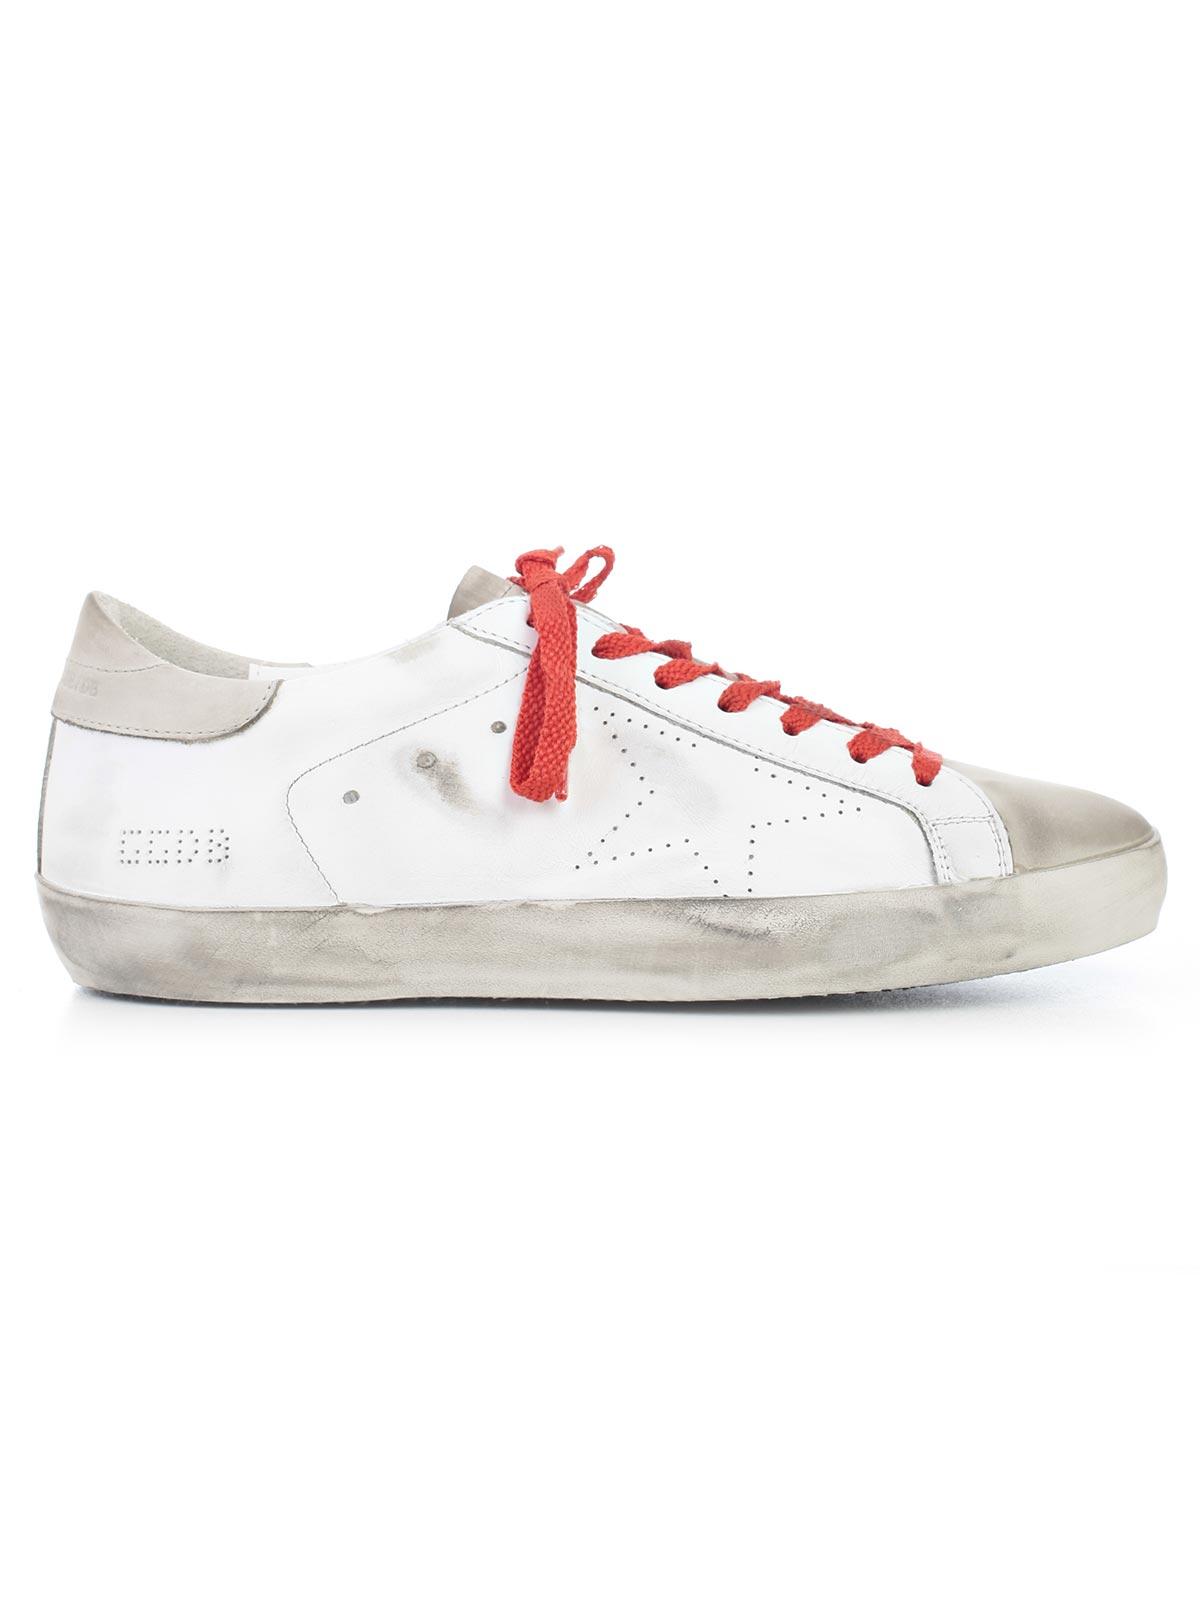 Picture of GOLDEN GOOSE DELUXE BRAND Sandals